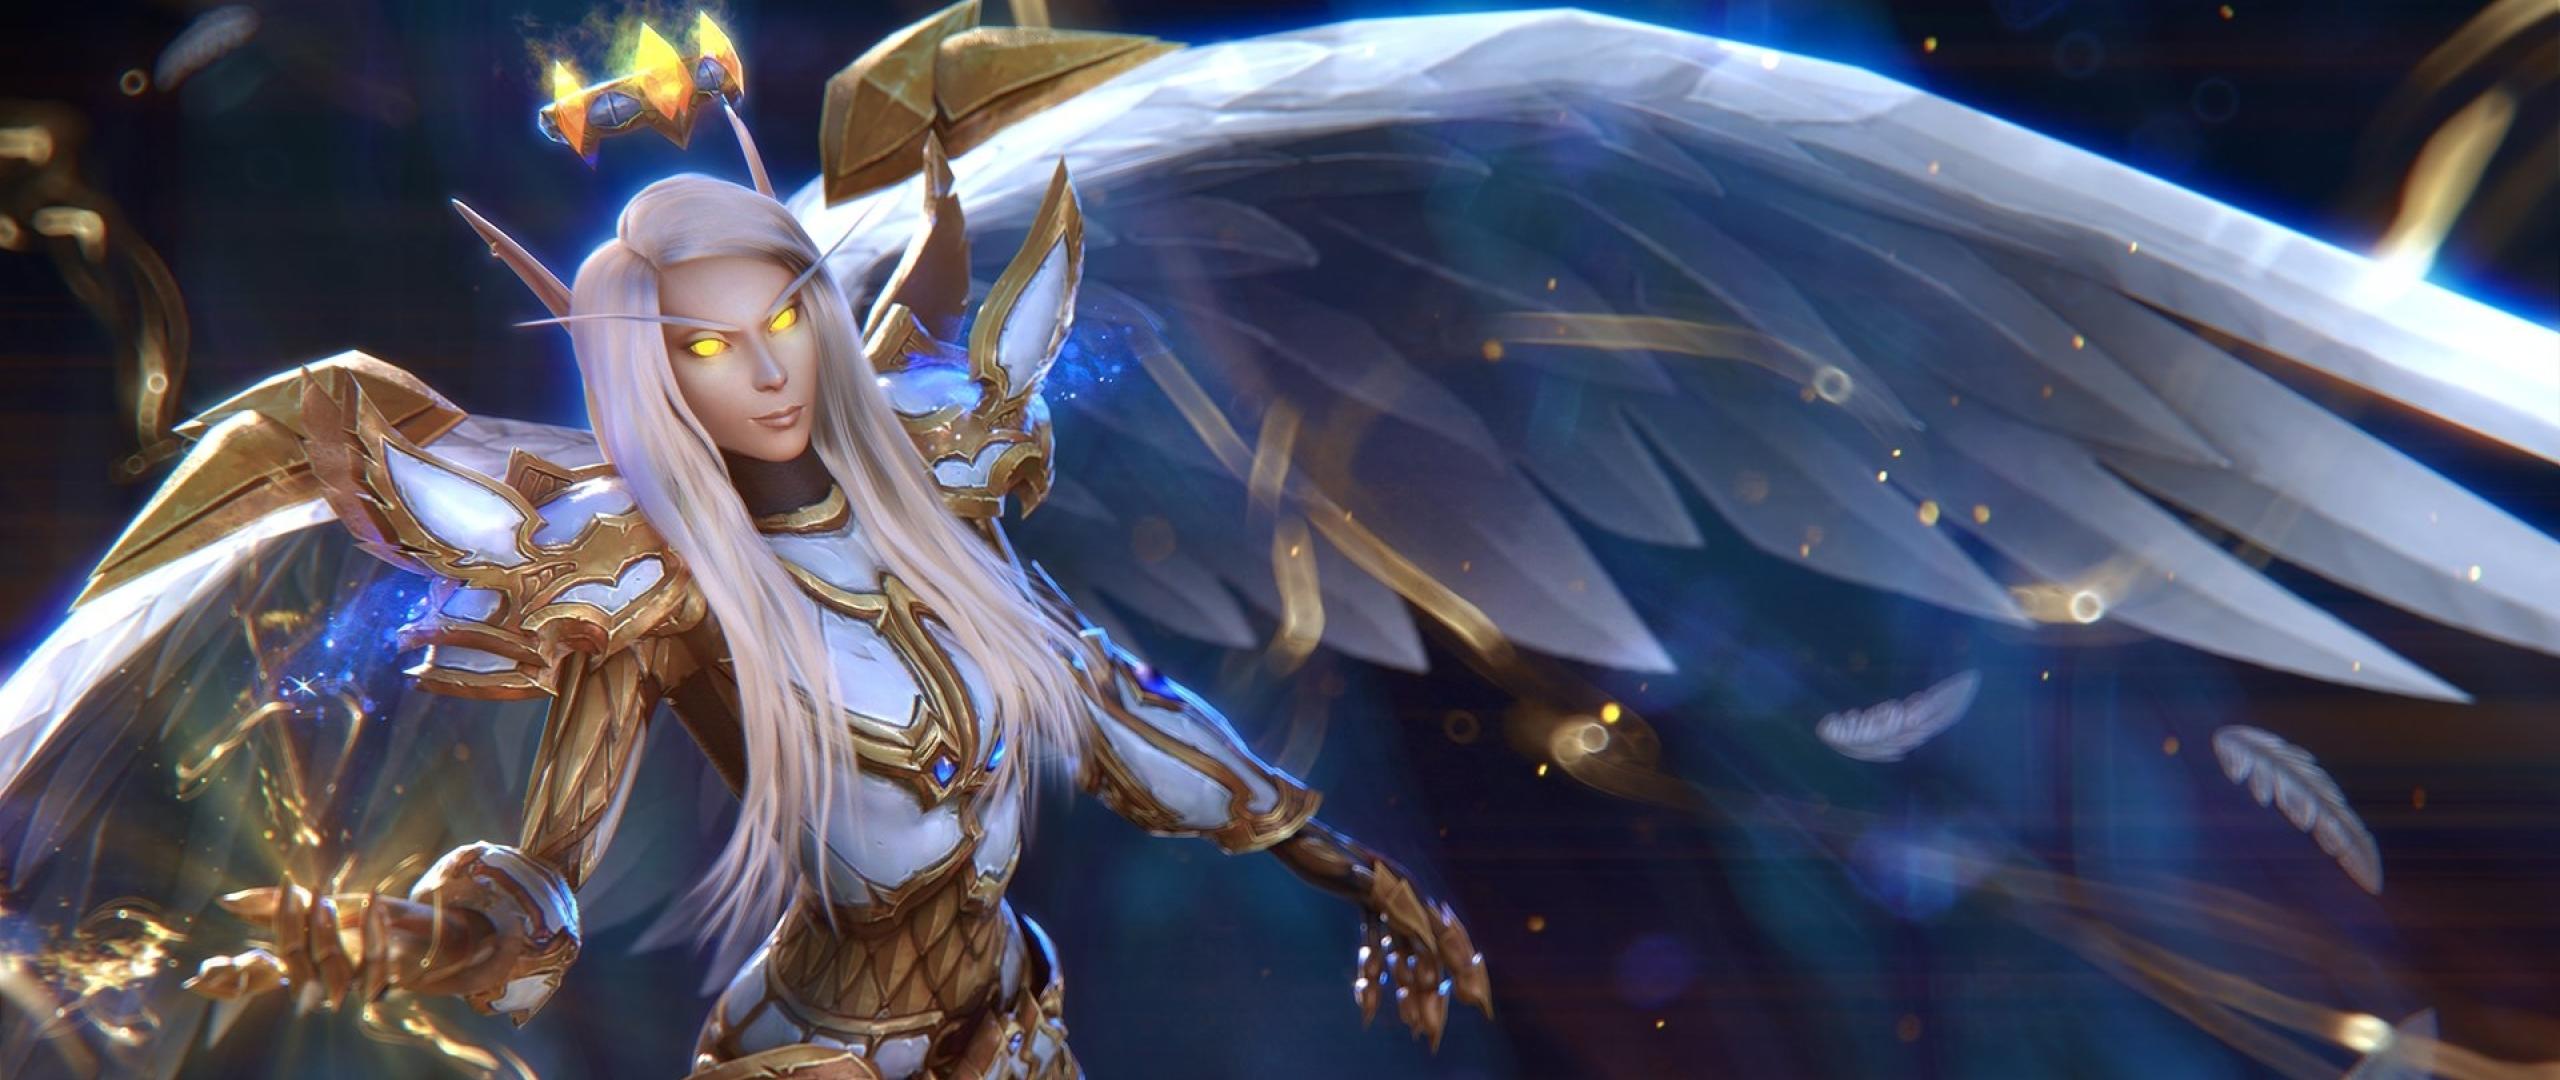 2560x1080 Paladin Warcraft 2560x1080 Resolution Wallpaper Hd